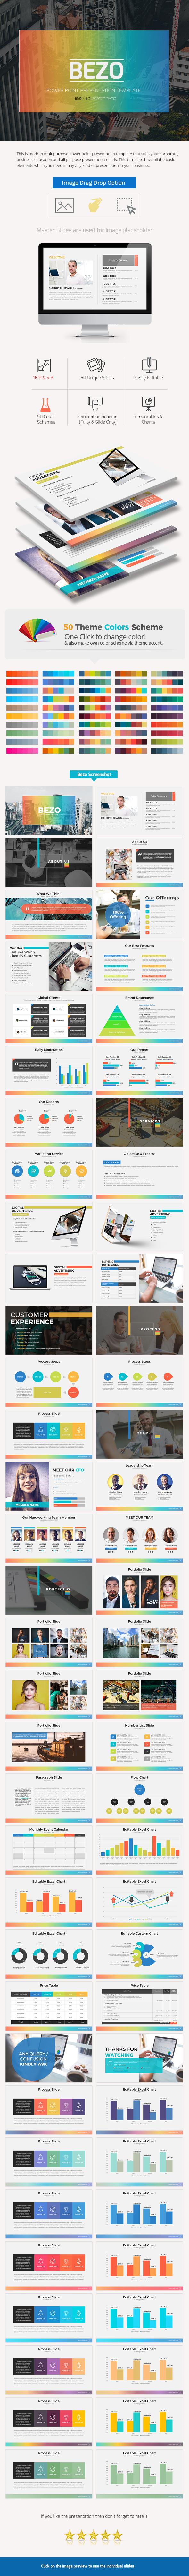 Bezo Power Point Presentation - Business PowerPoint Templates